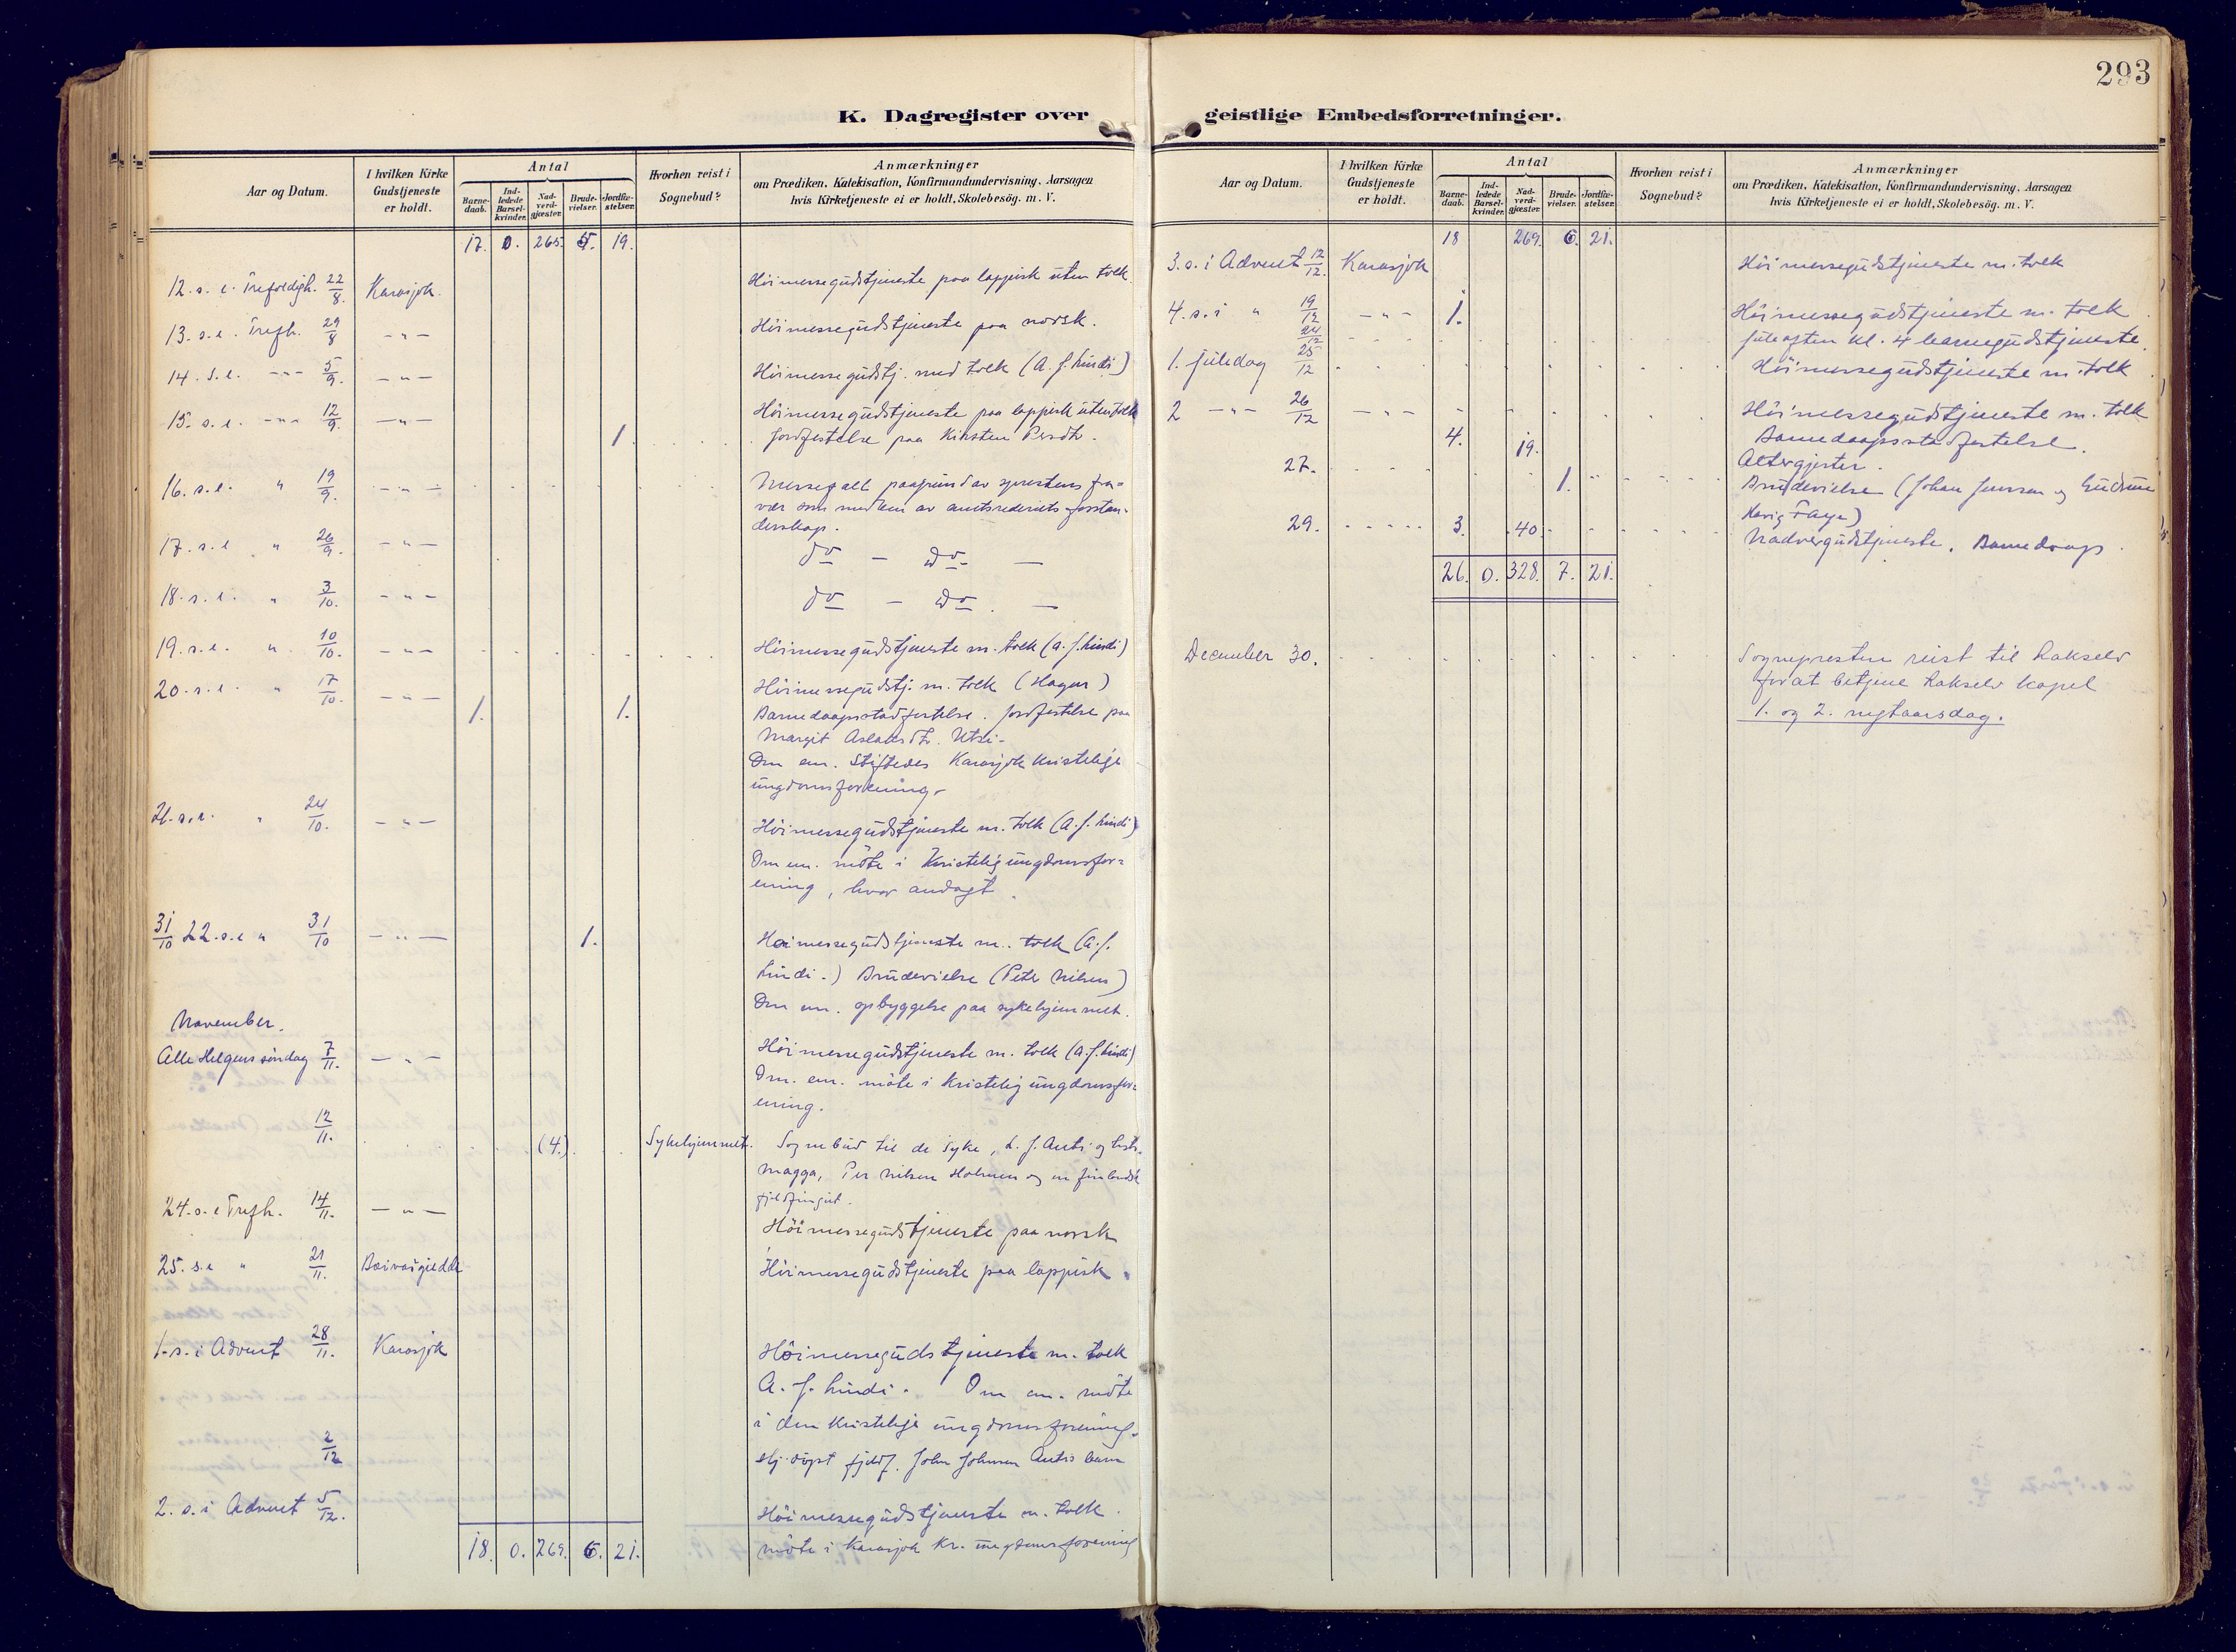 SATØ, Karasjok sokneprestkontor, H/Ha: Ministerialbok nr. 3, 1907-1926, s. 293